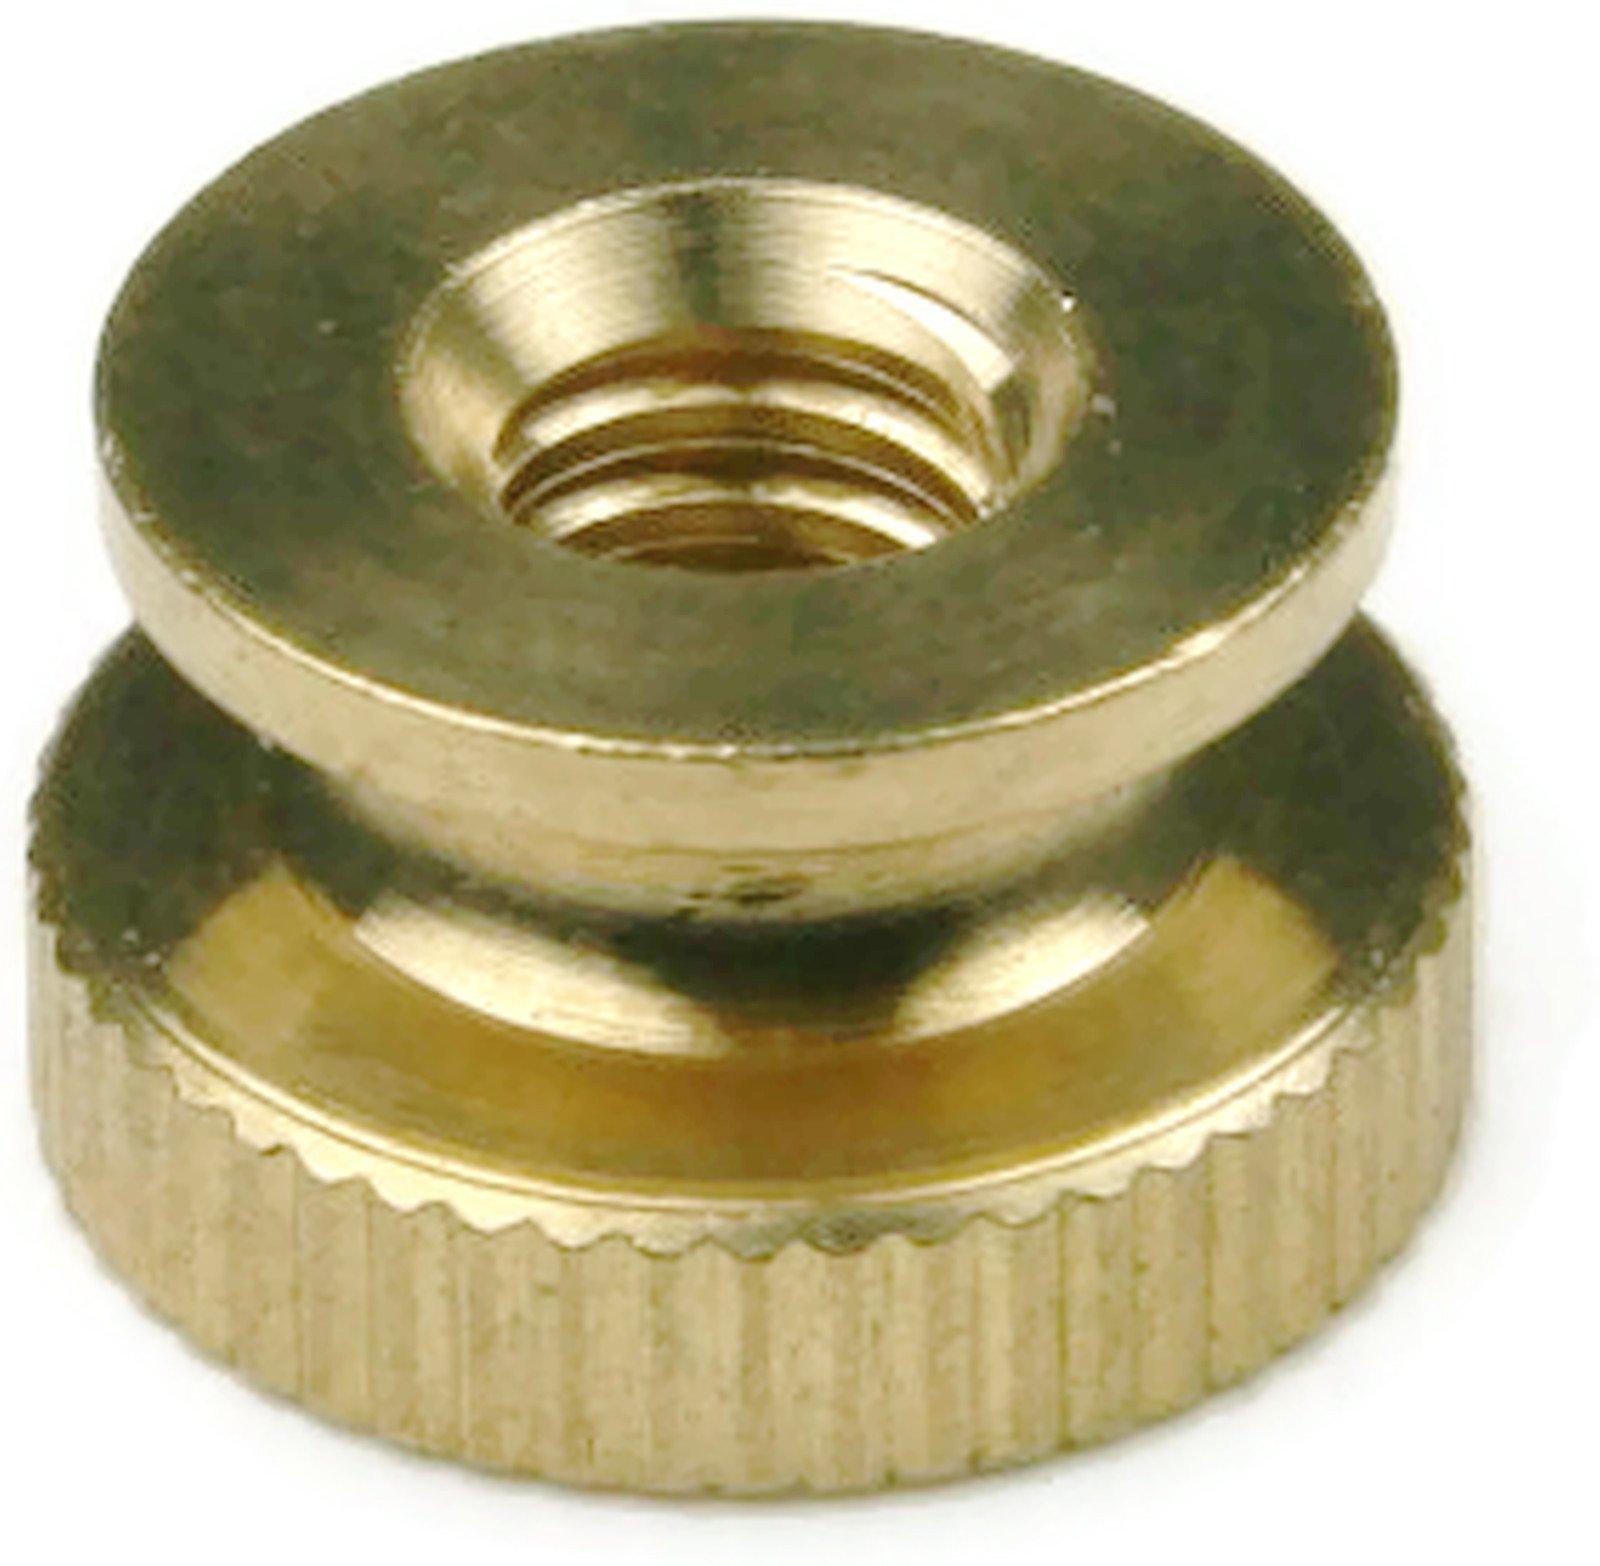 Brass Knurled Thumb Nut Solid Brass 5/16-18 - Solid Brass - (Quantity: 100 pcs) - (11/16 Dia x 13/32 Thick)